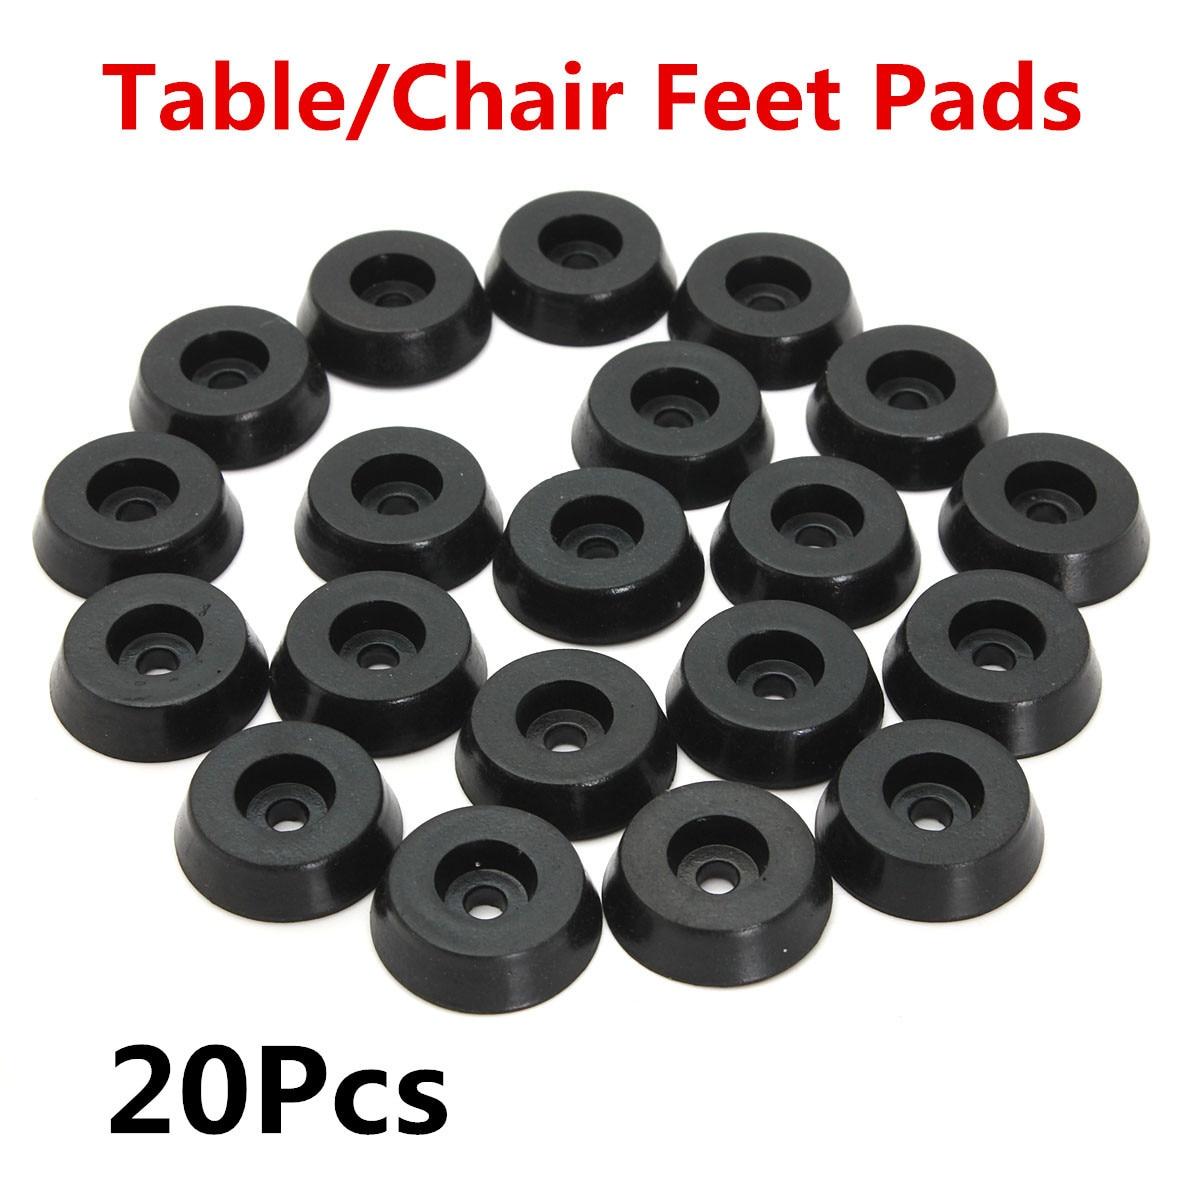 20pcs Rubber Table Furniture Chair Table Feet Leg Bottom Tips Pad Tile Floor Protectors Black 18x15x5mm chair